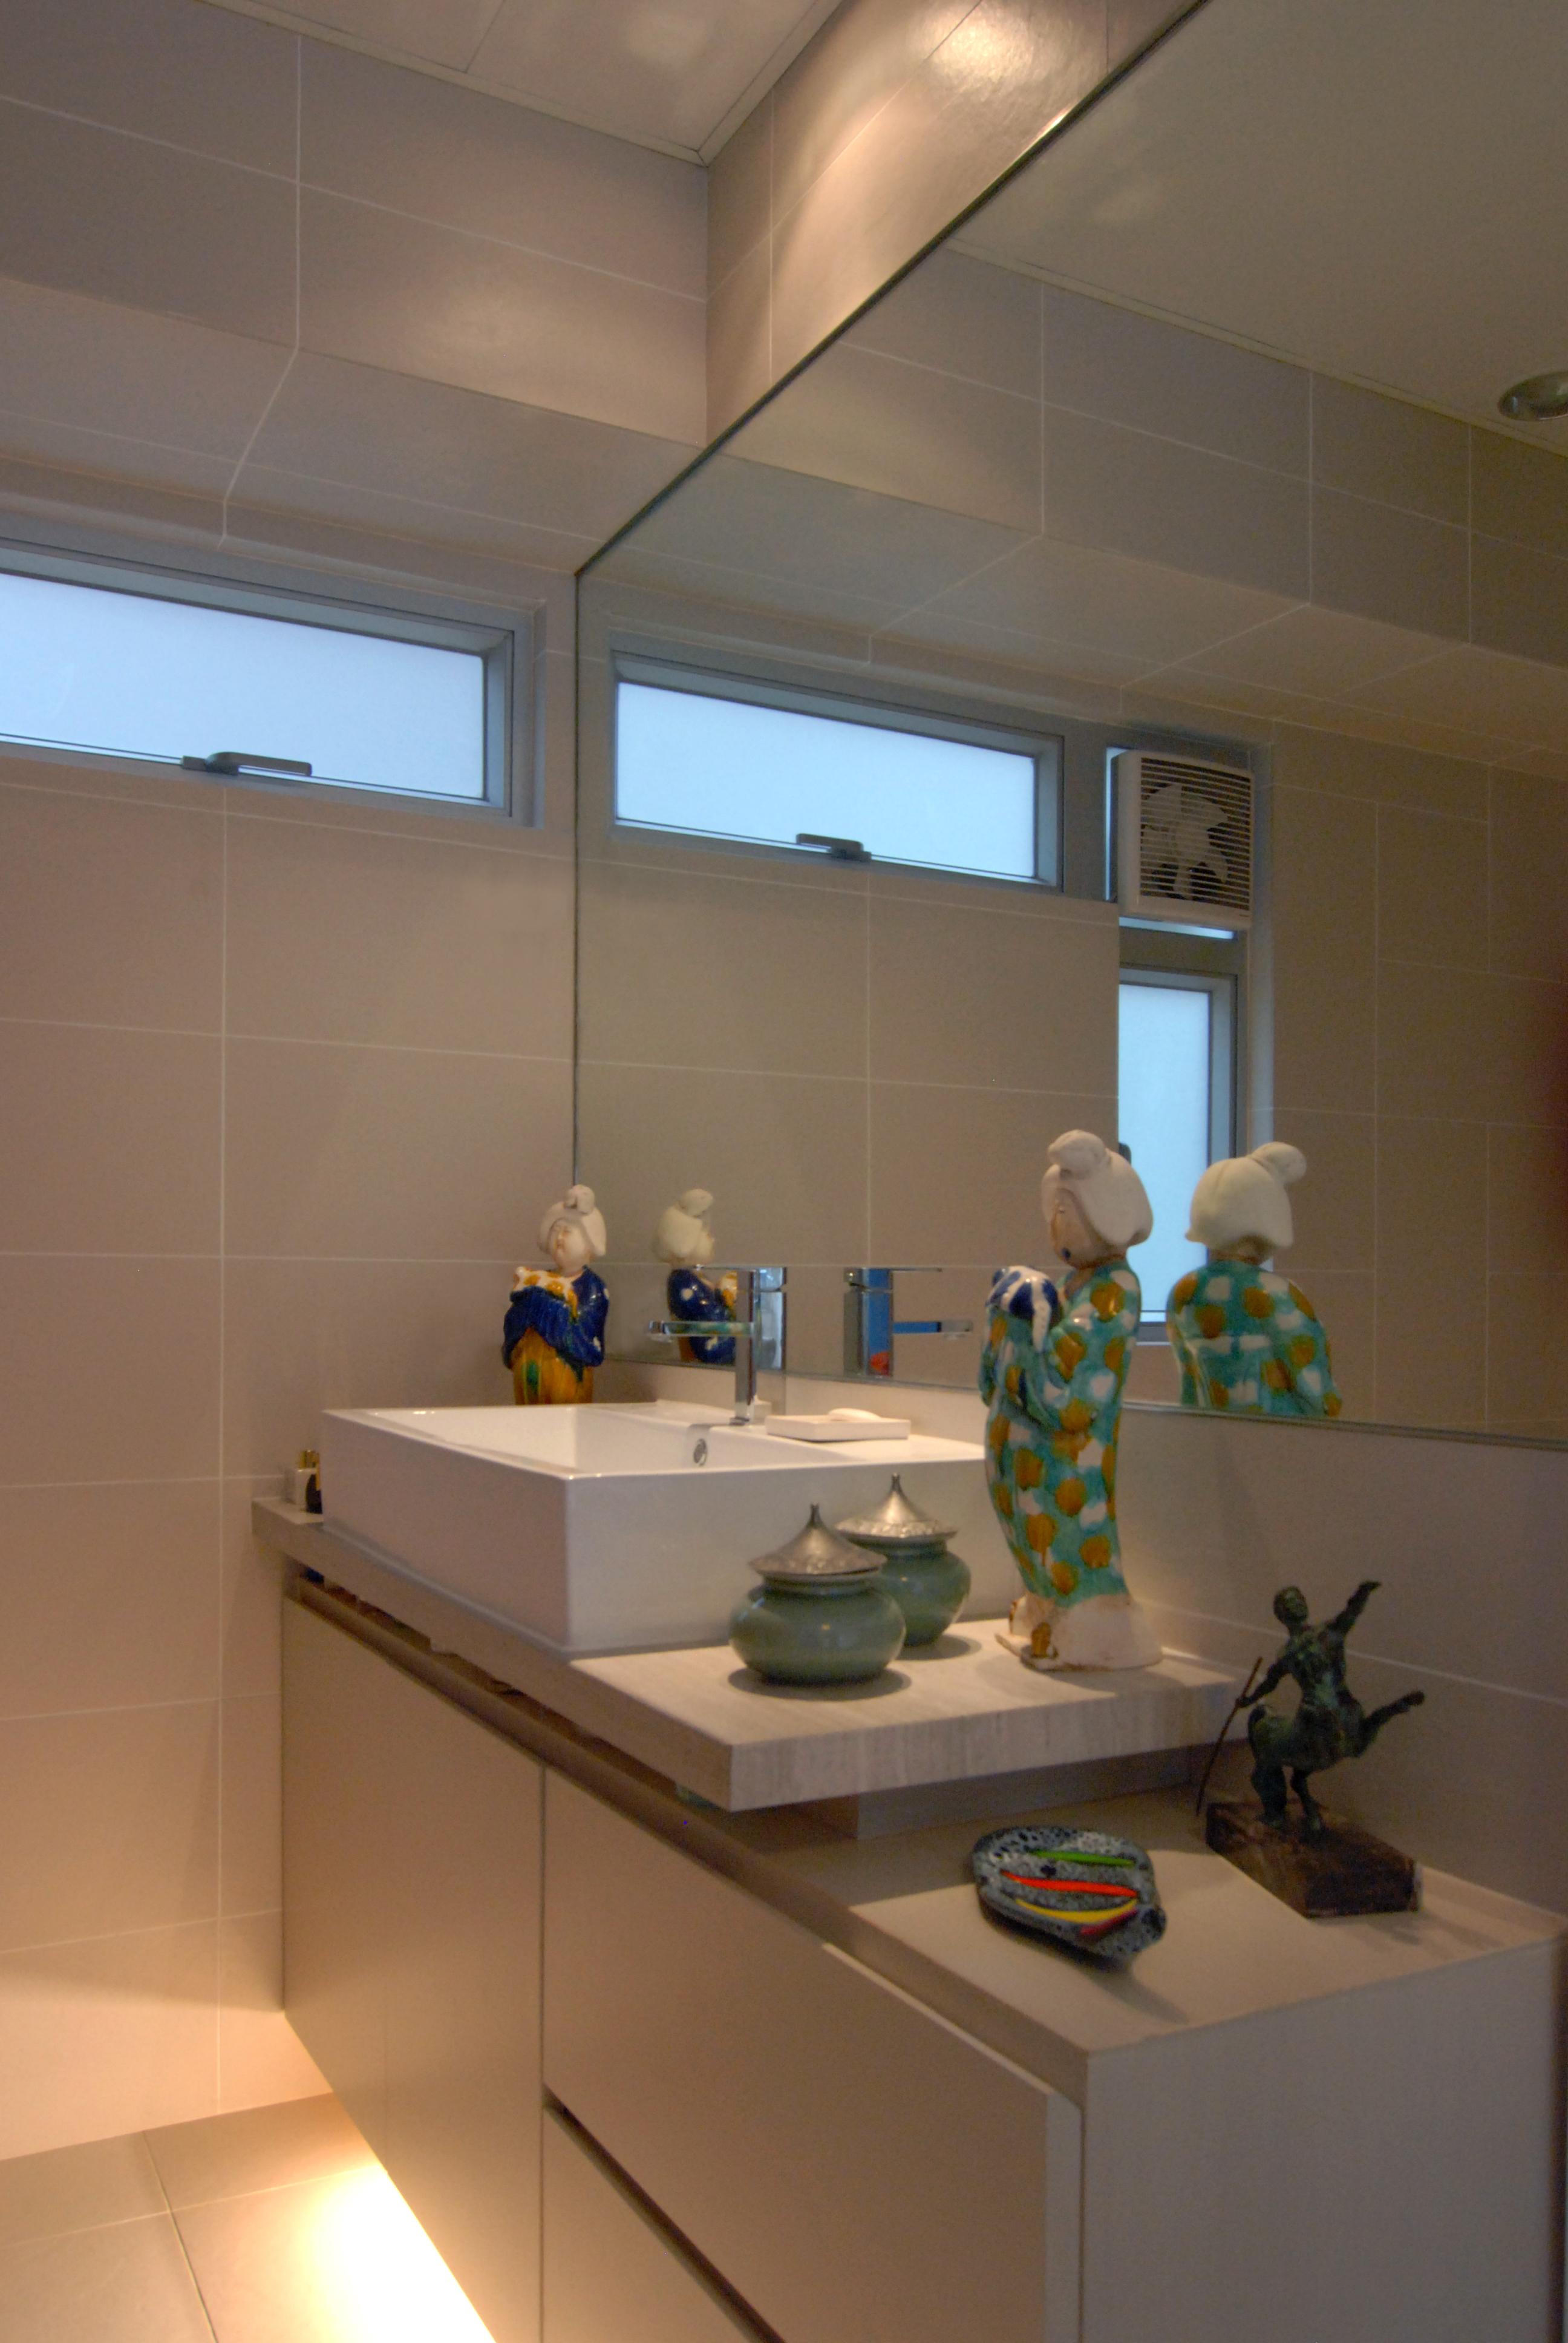 Stefano Tordiglione - Rednaxela Terrace - Restroom 1